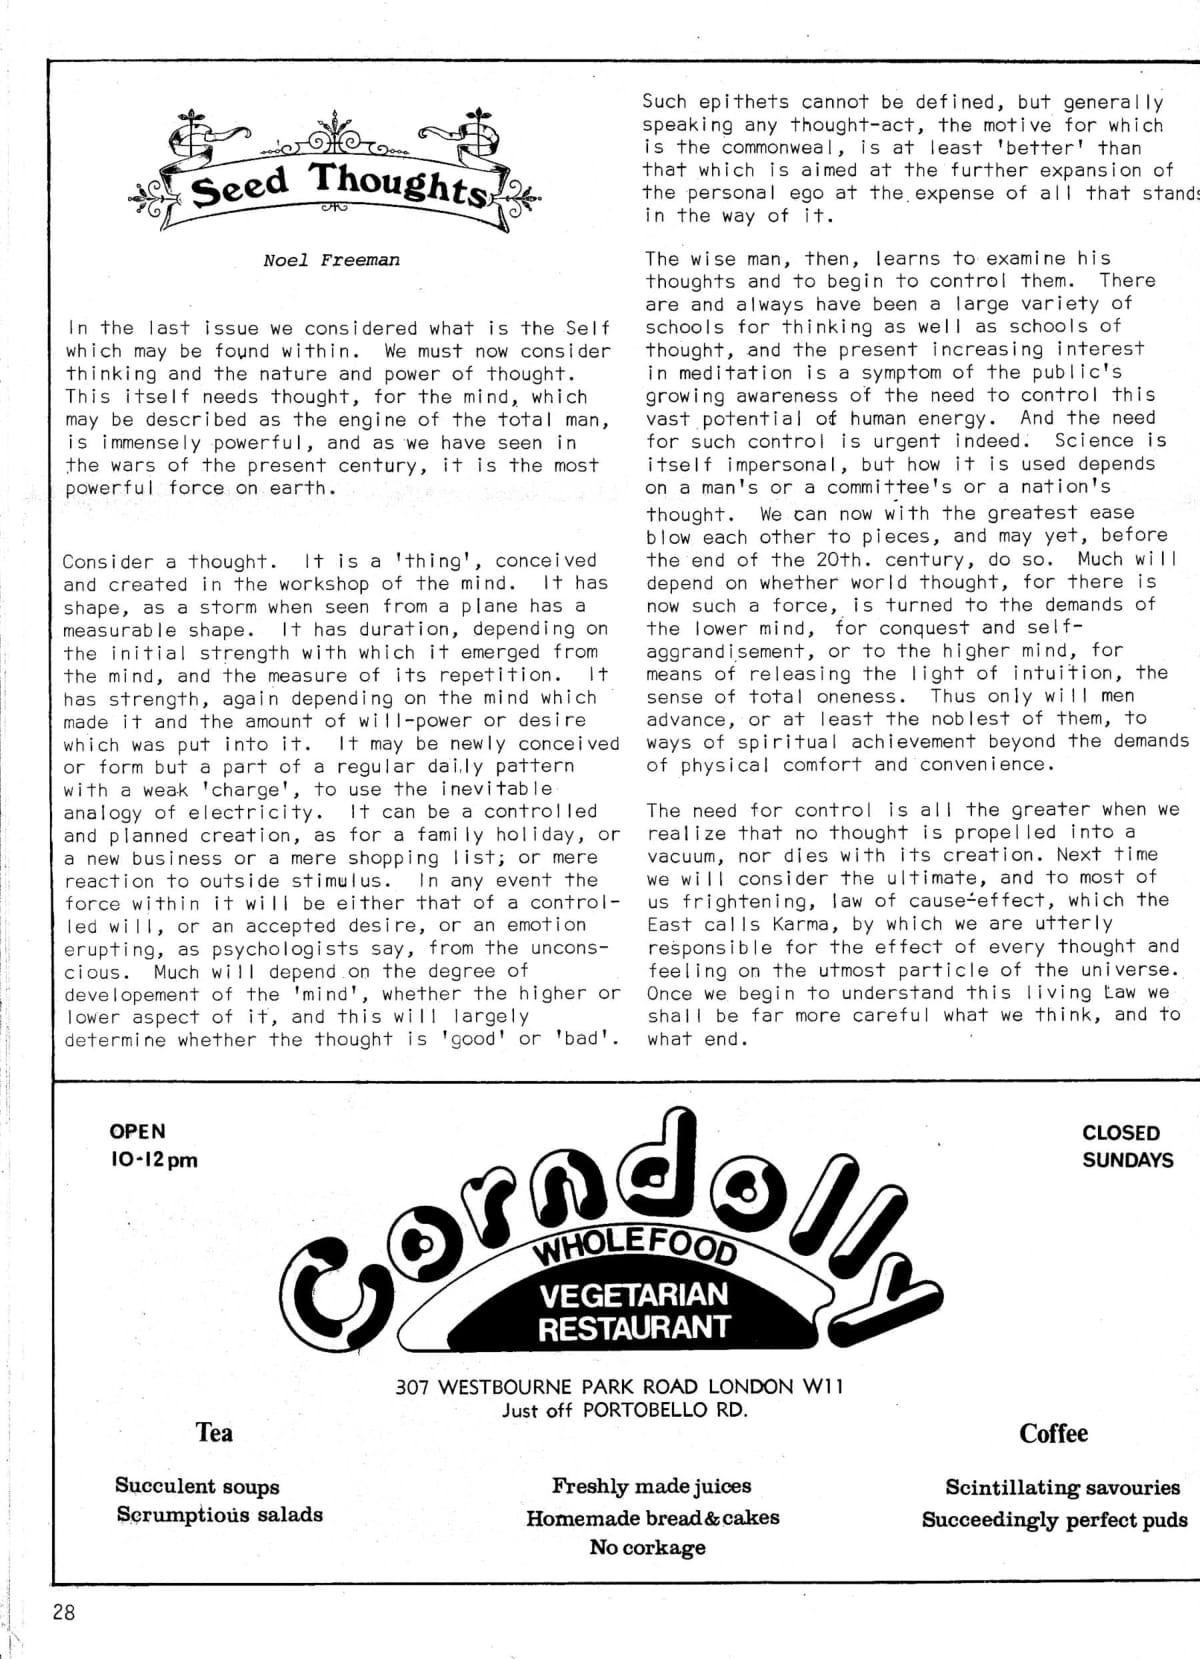 seed-v2-n5-may1973-28.jpg